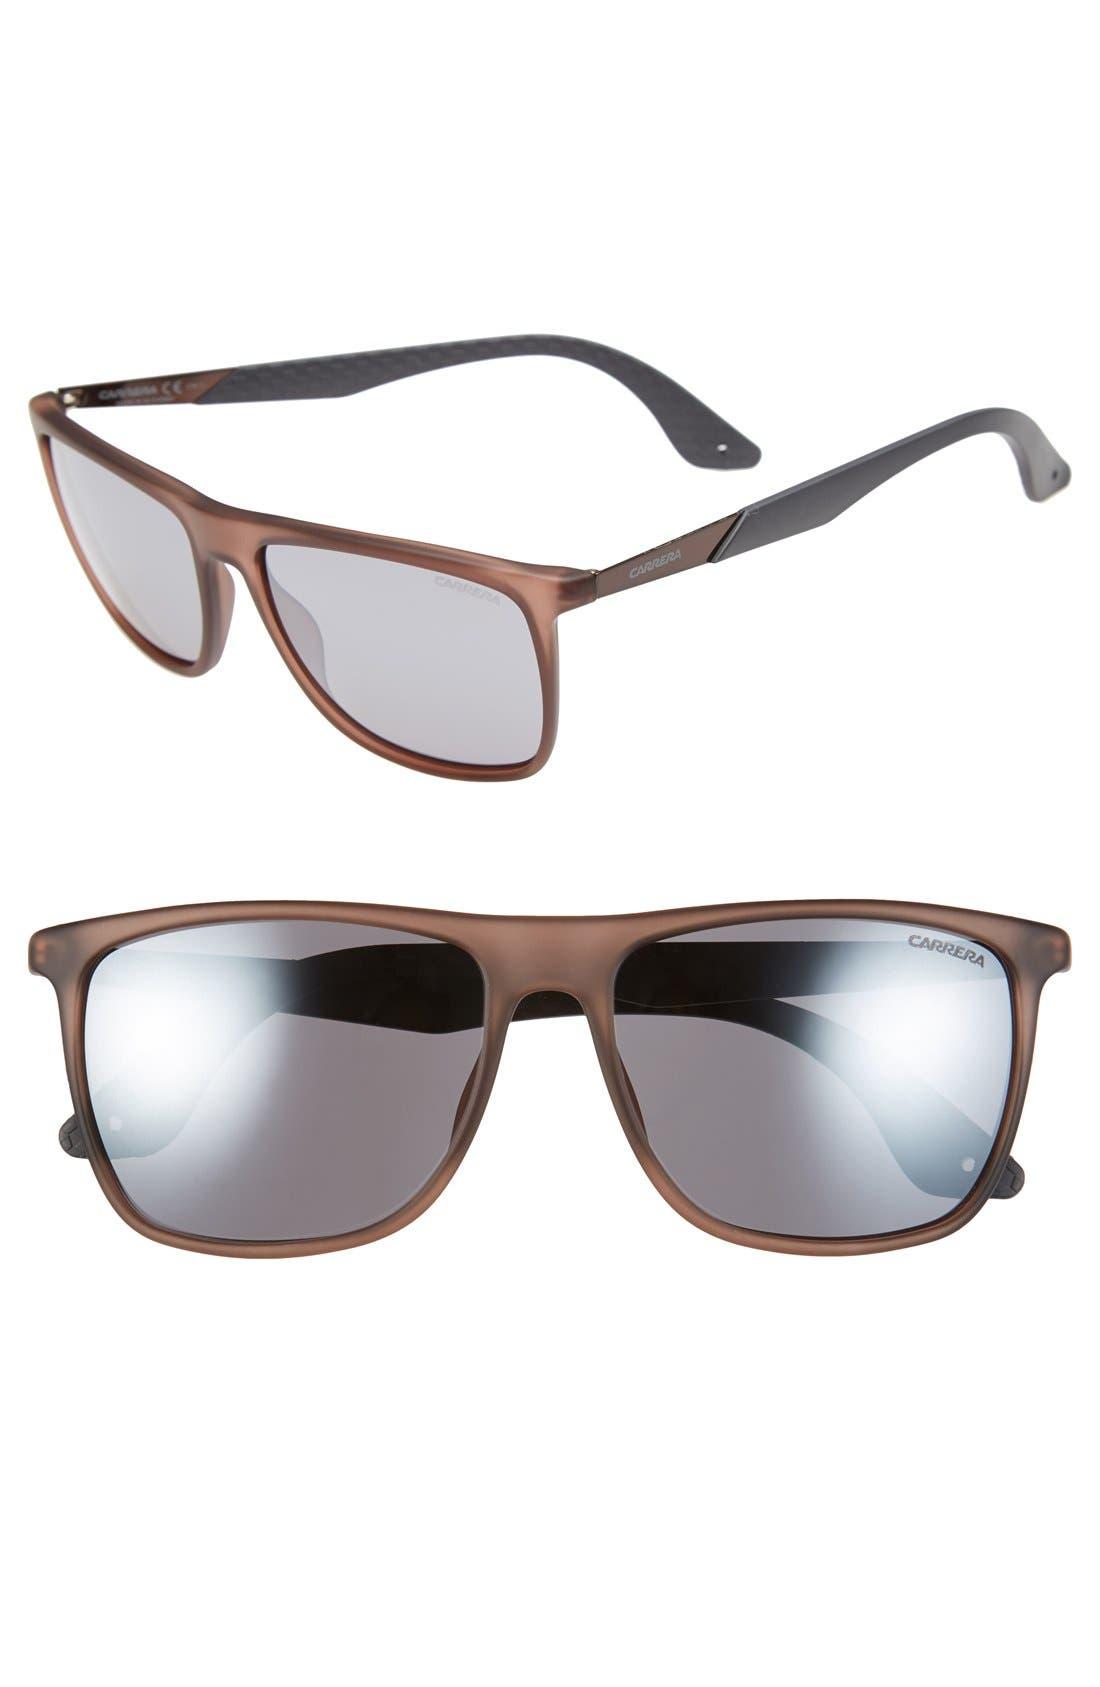 Carrera Eyewear 5m Retro Sunglasses -